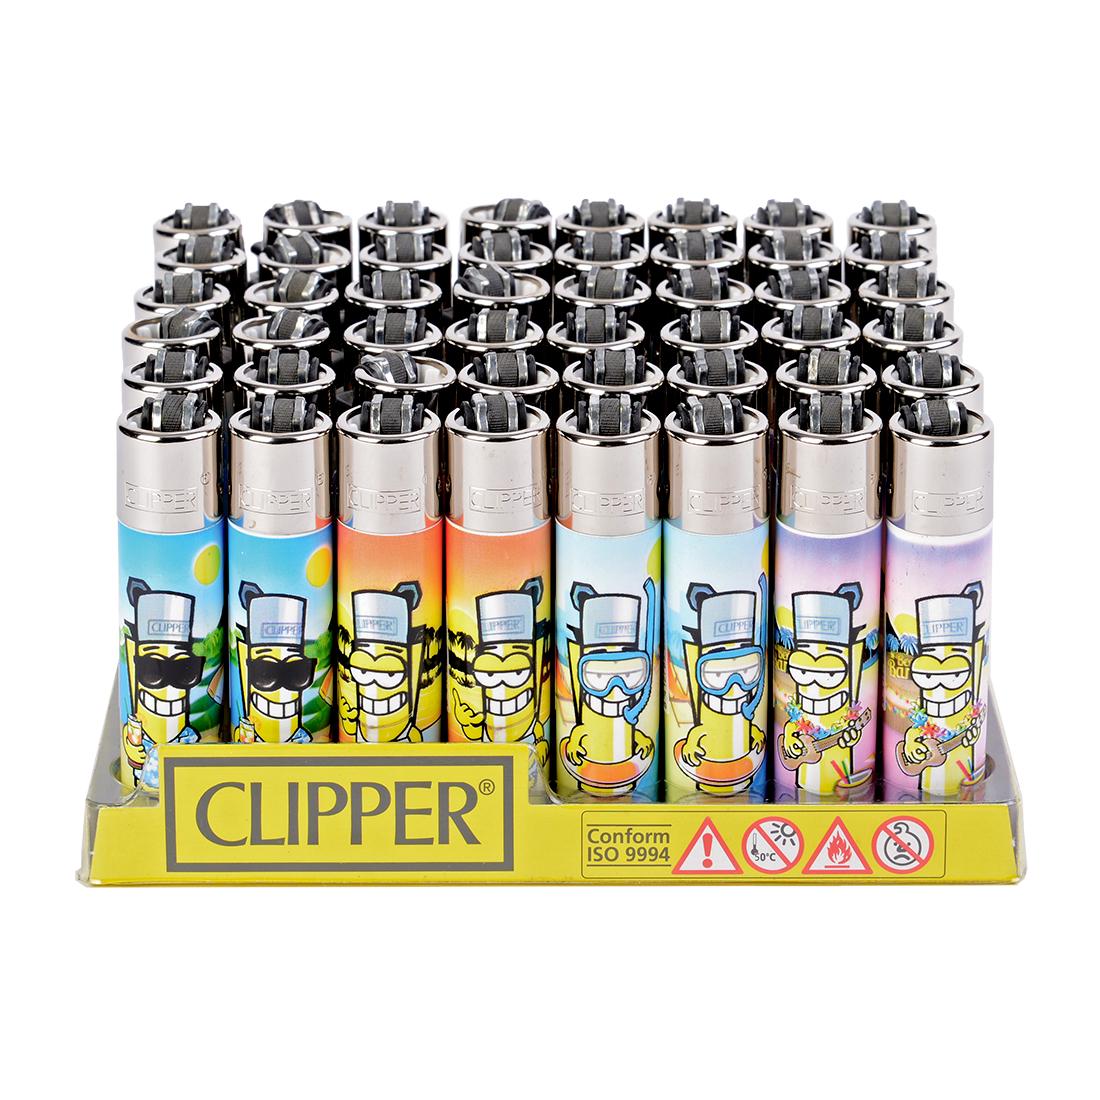 CLIPPER CLIPPER-MAN SUMMER X48